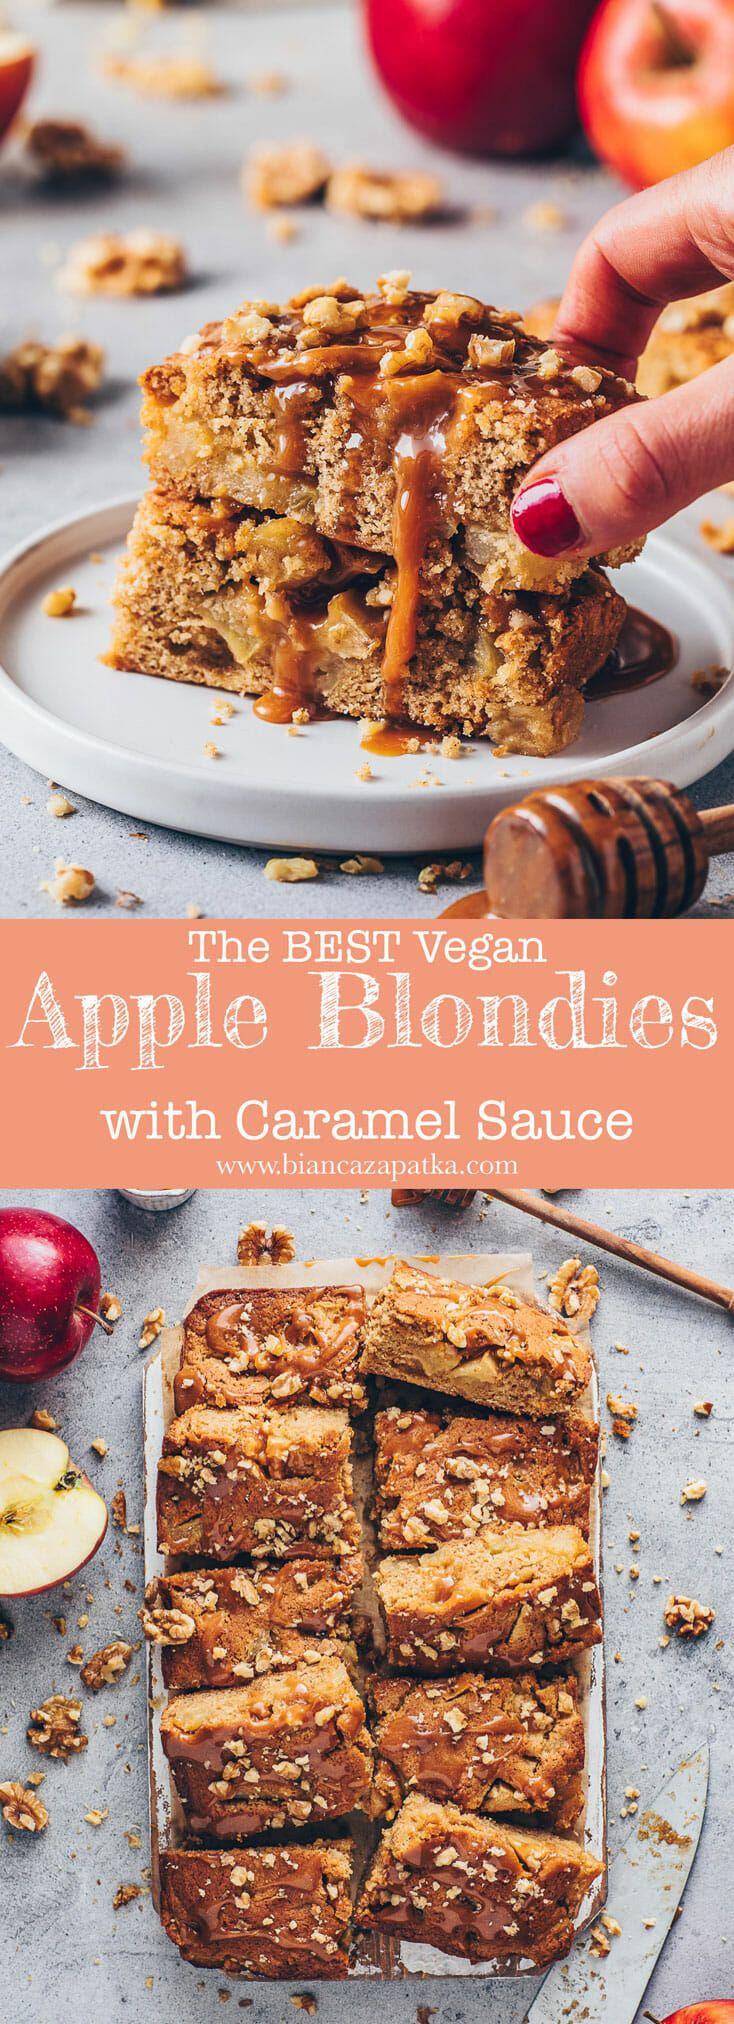 Apple Blondies with Caramel   Vegan Apple Bars - Bianca Zapatka   Recipes